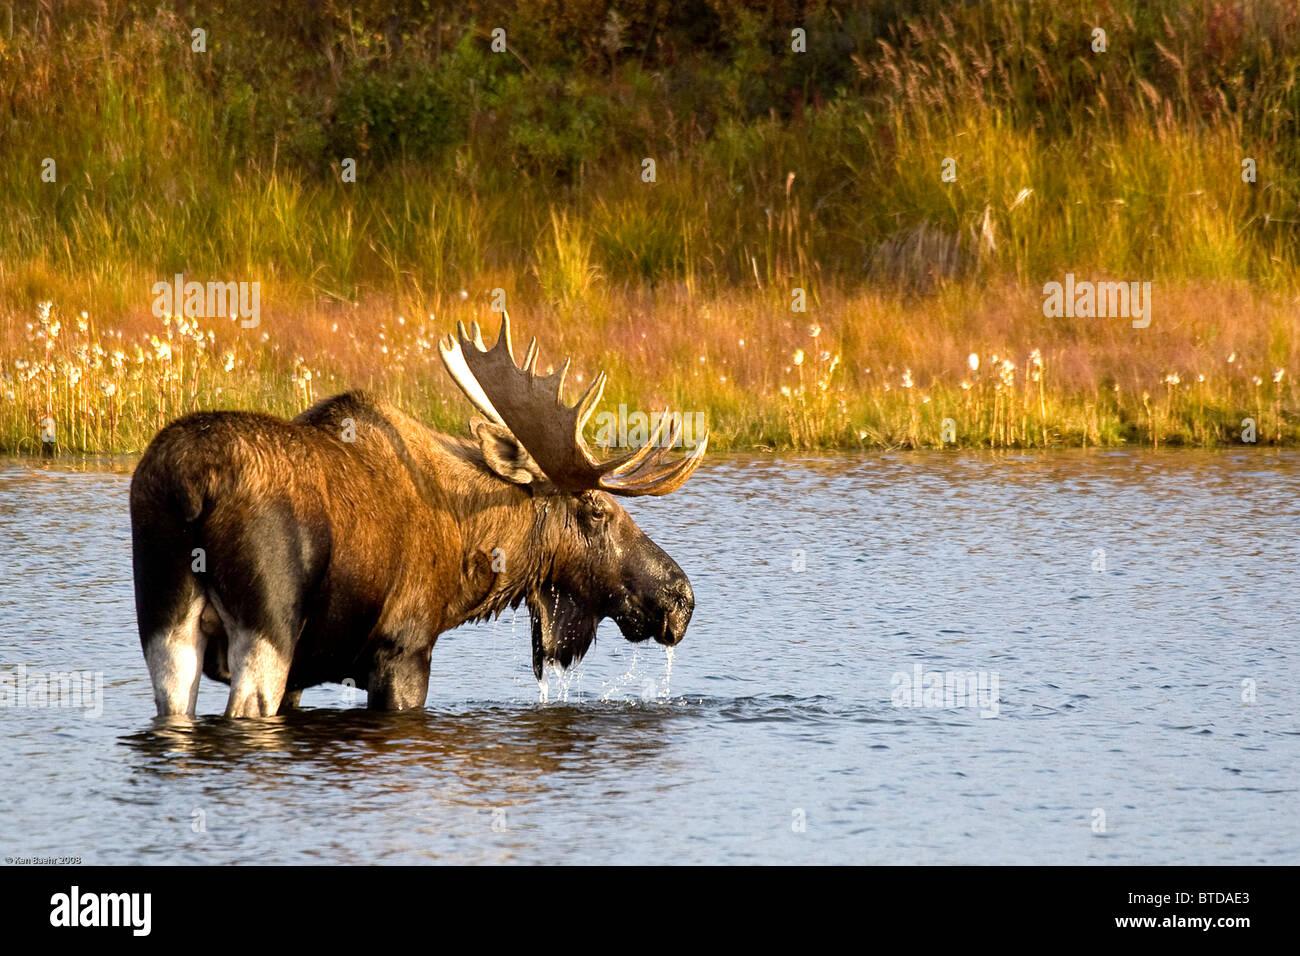 A large bull moose wades through a permafrost pond in Denali National Park near Wonder Lake, Interior Alaska, Fall - Stock Image